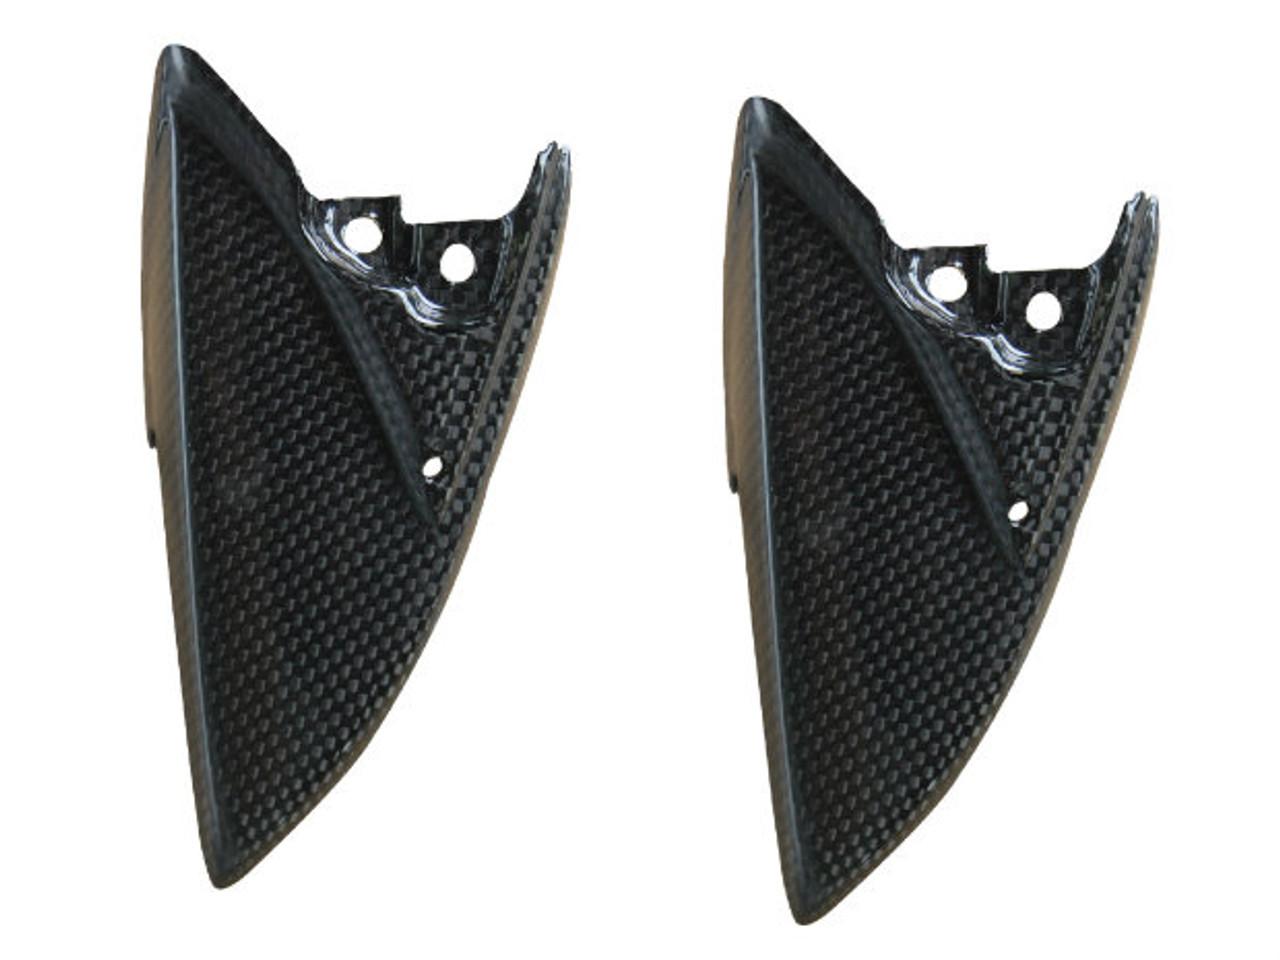 Seat Cowl Lower Panels for Suzuki  GSXR 600, GSXR 750  2011-2019 in Glossy Plain Weave Carbon Fiber